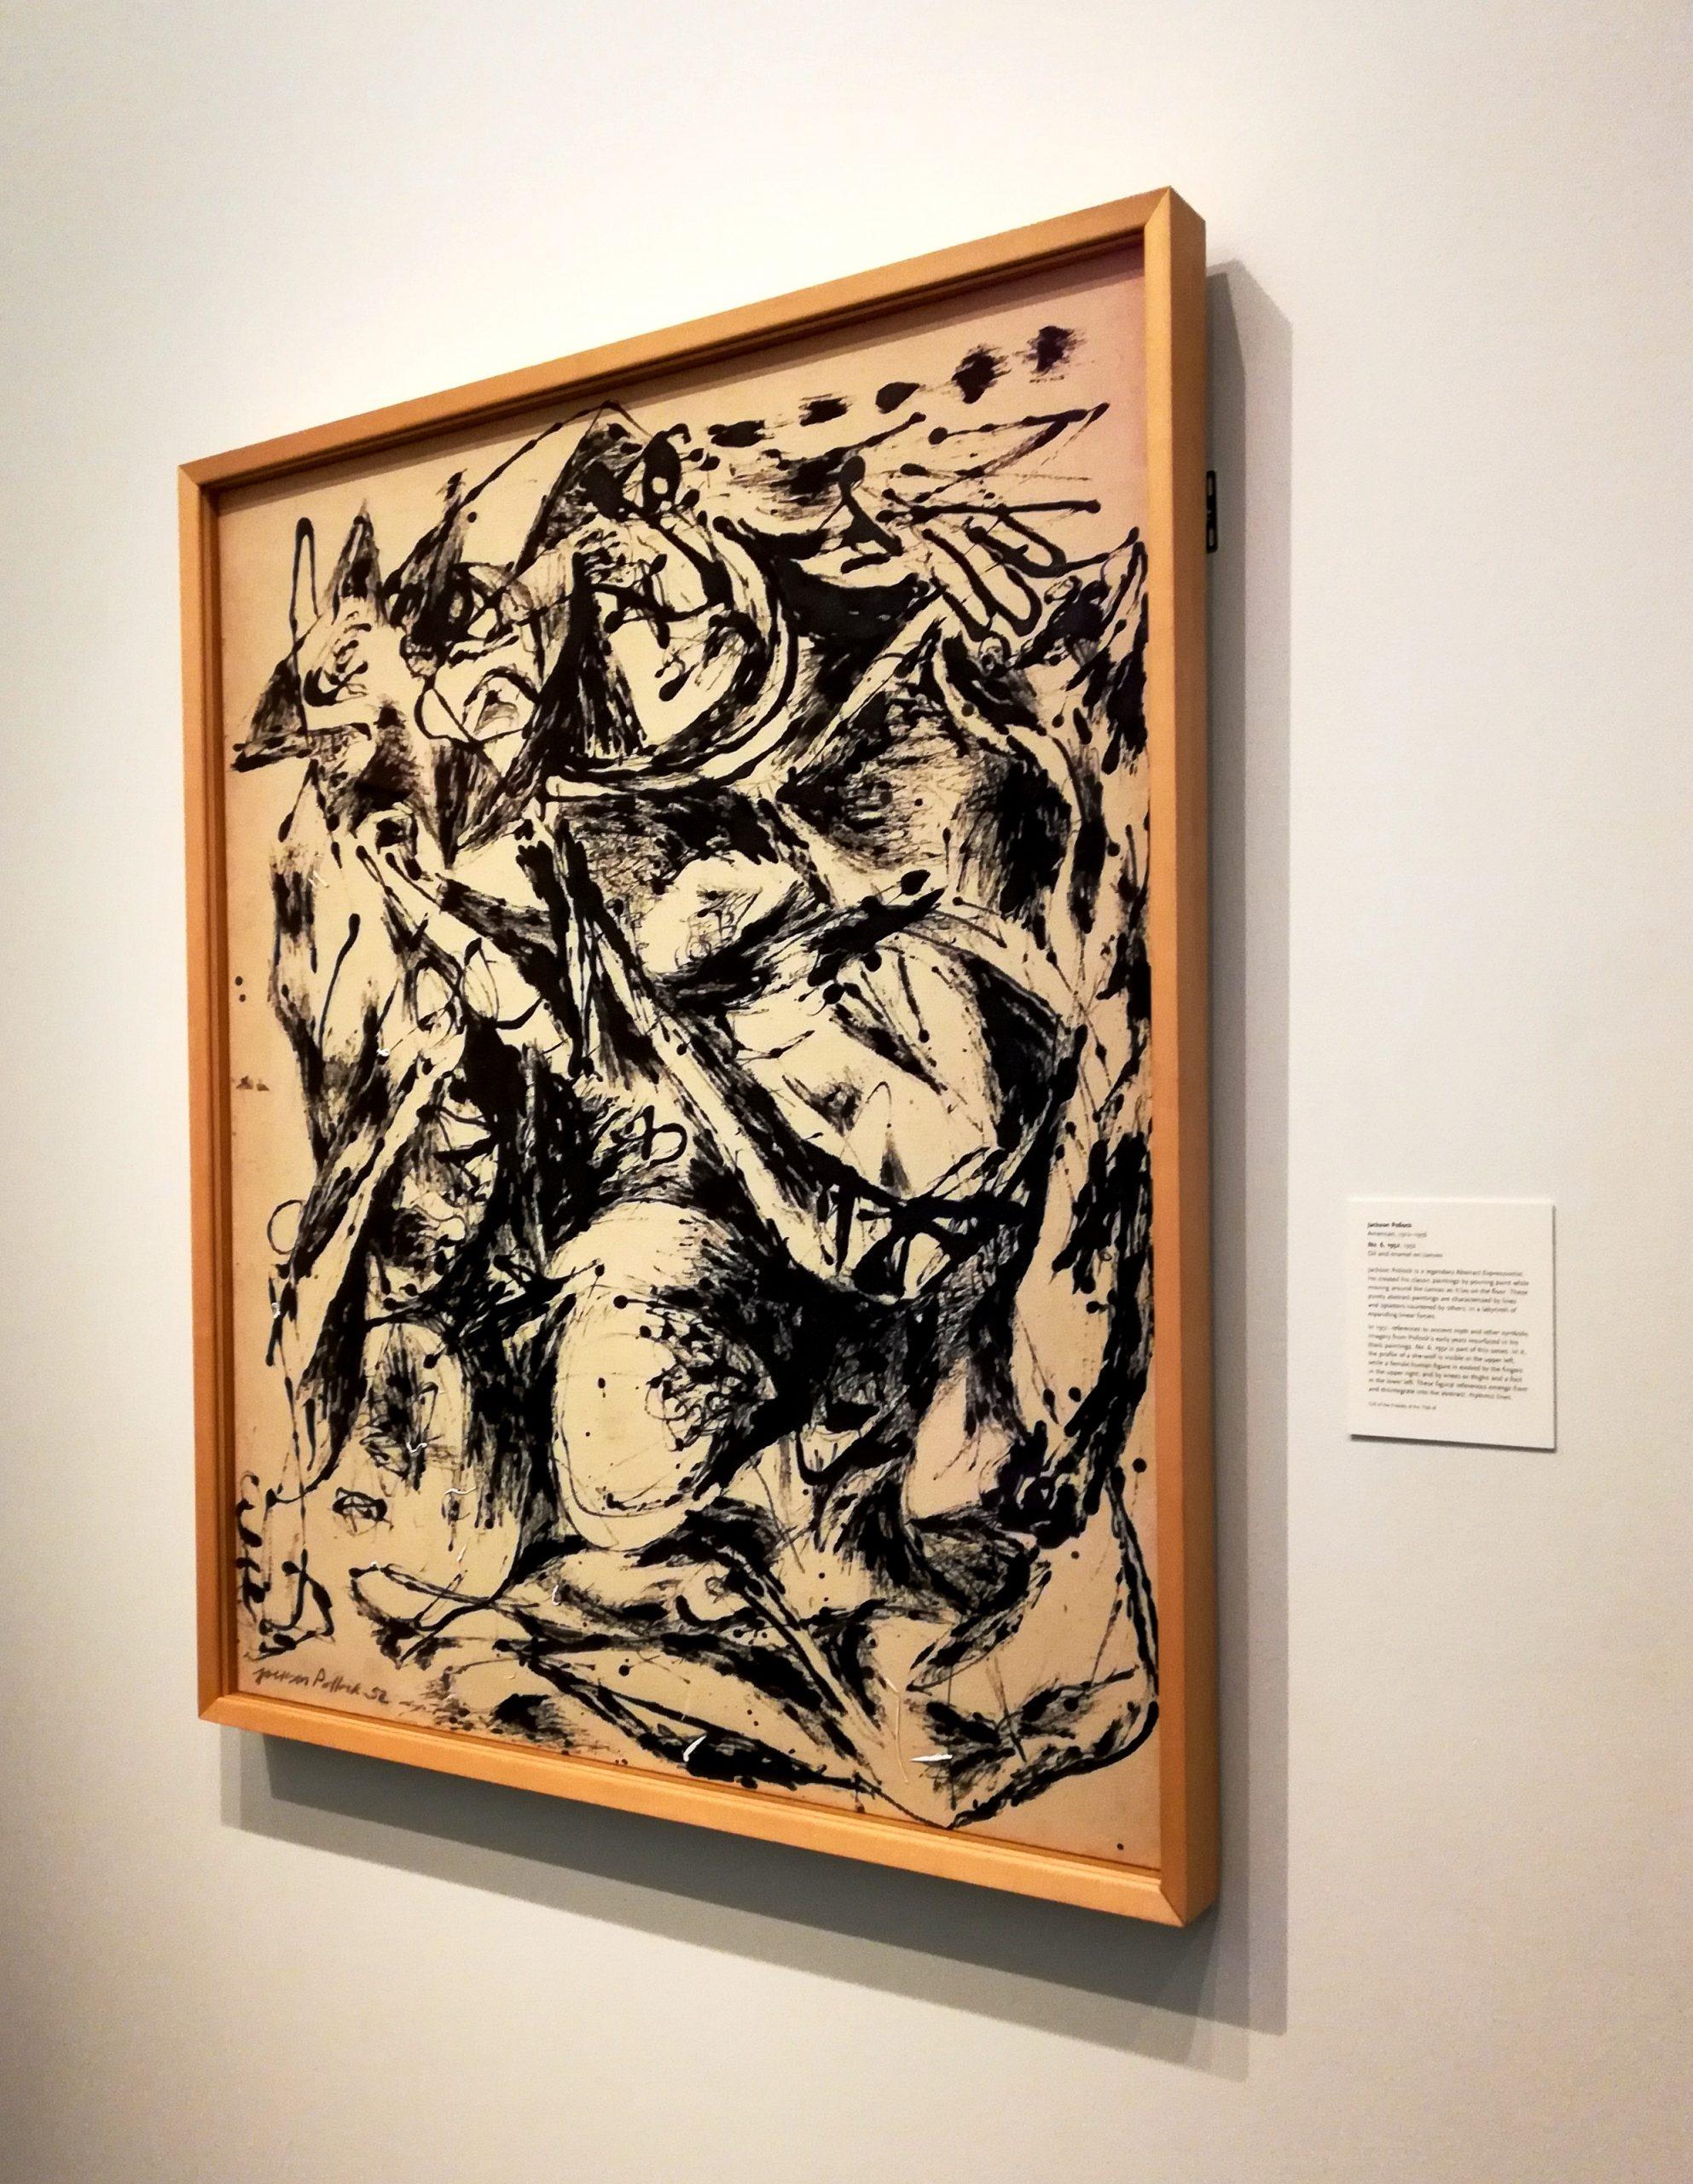 Jackson Pollock Black and White Number 6 Nelson-Atkins Museum of Art Kansas City KCMO